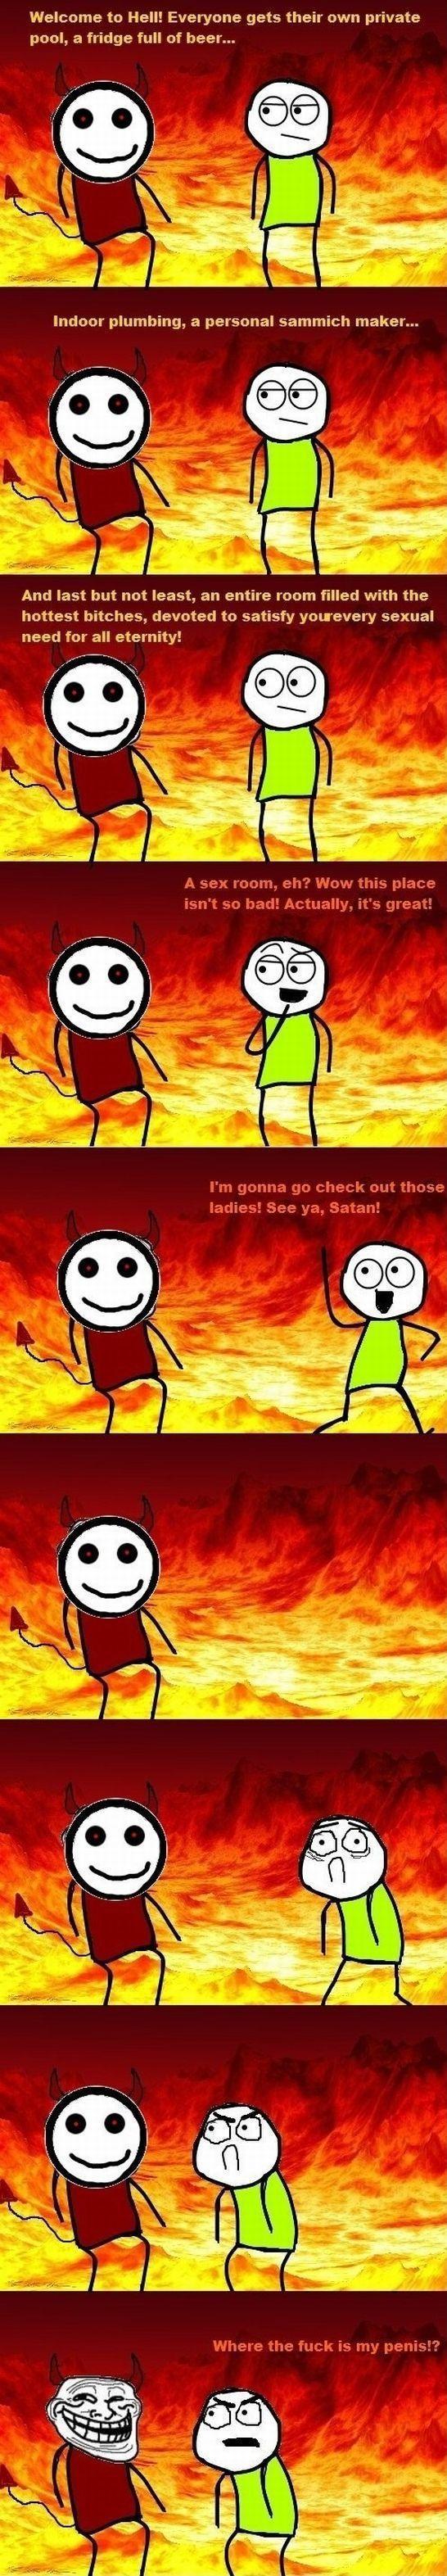 hell.jpg (323 KB)